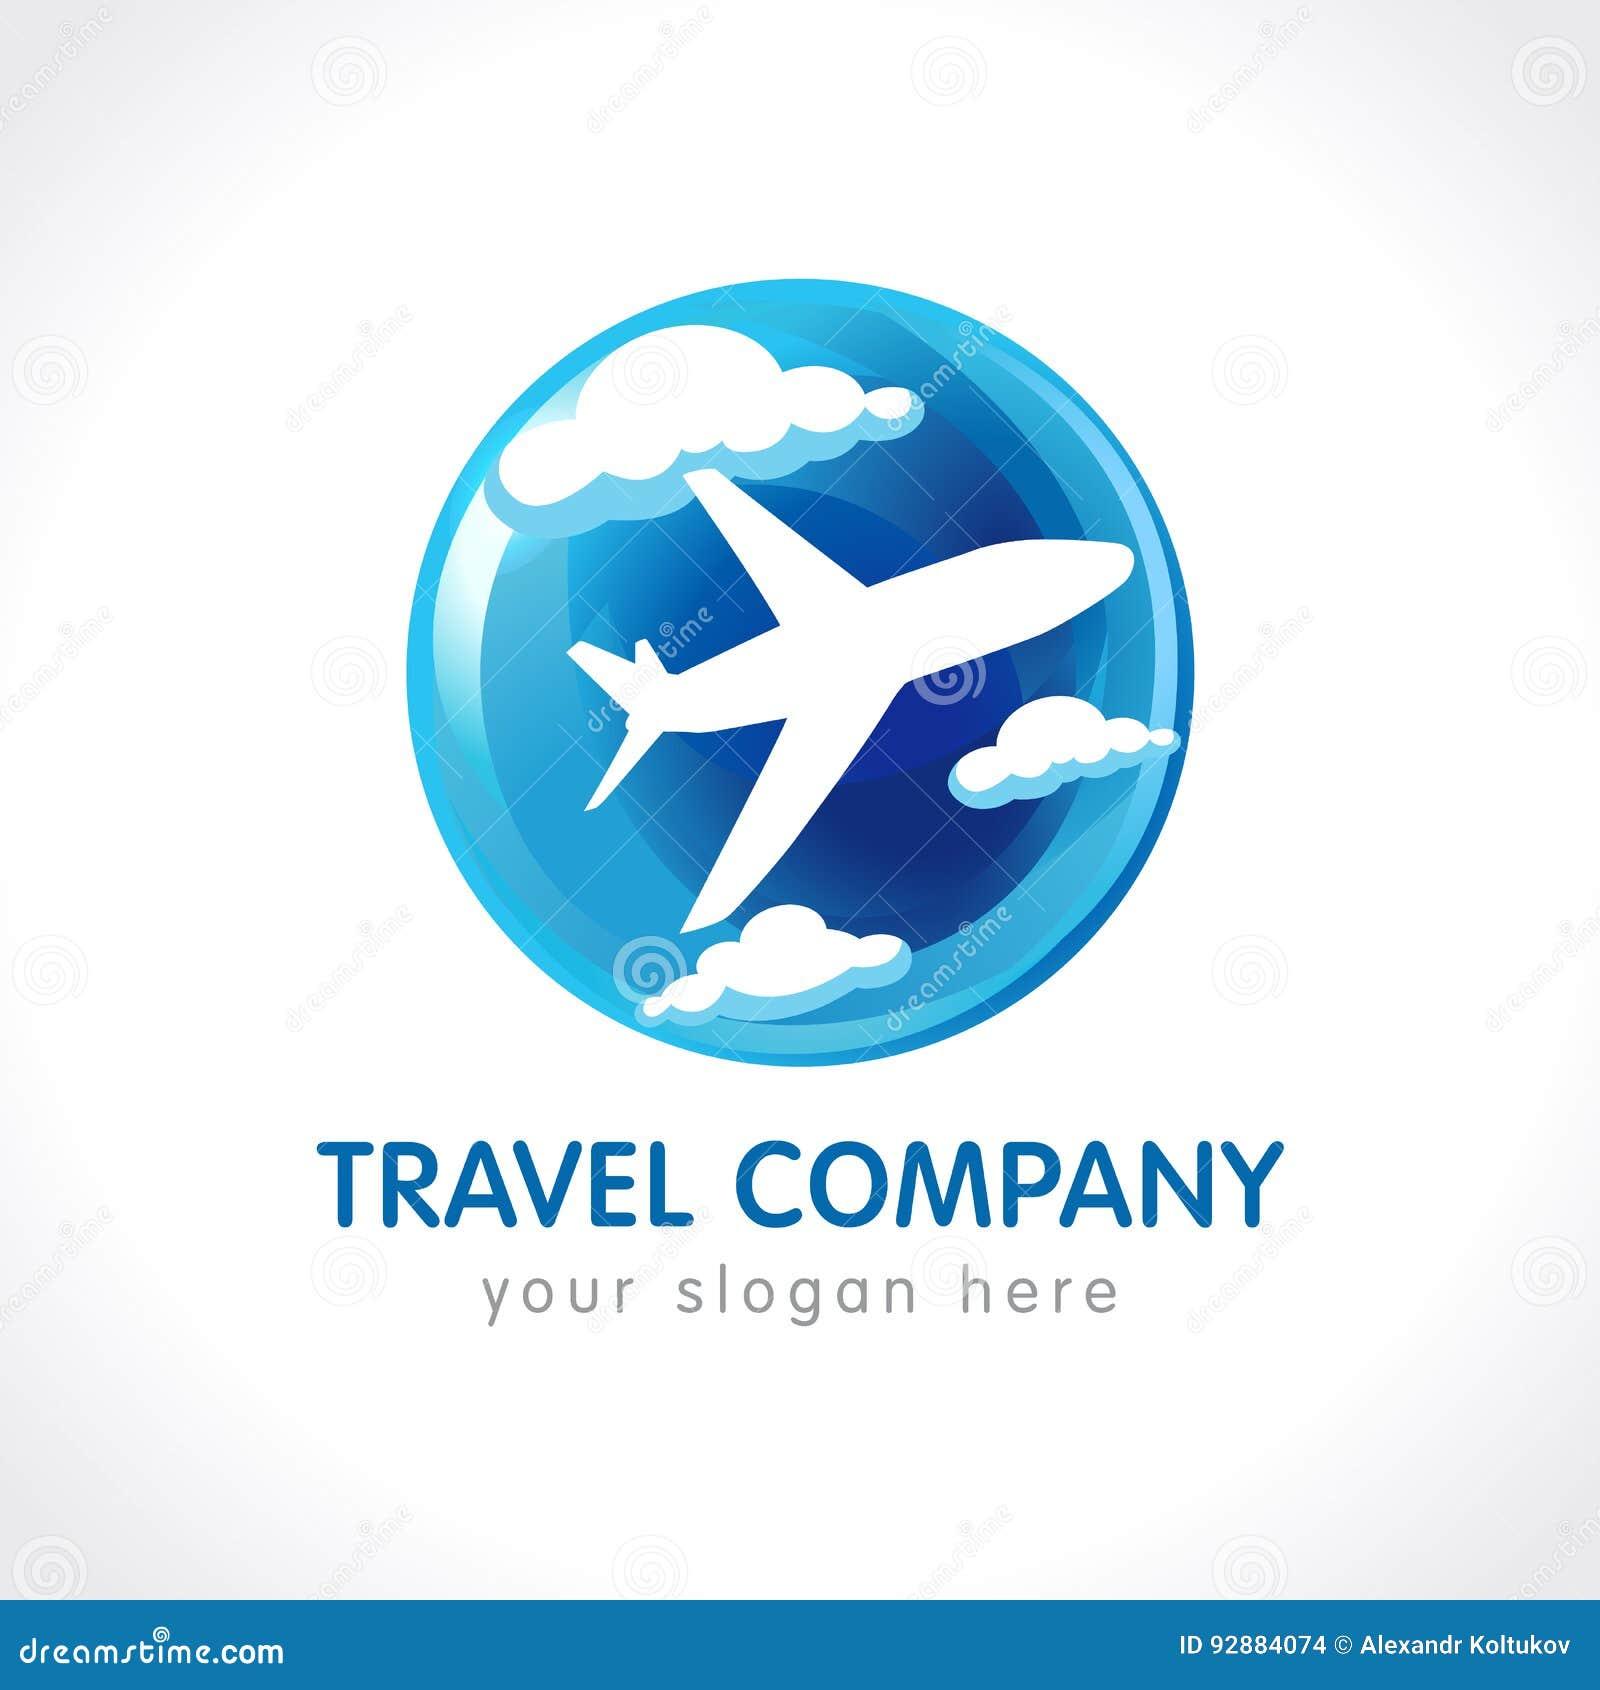 Travel Company Logo . Vector Illustration